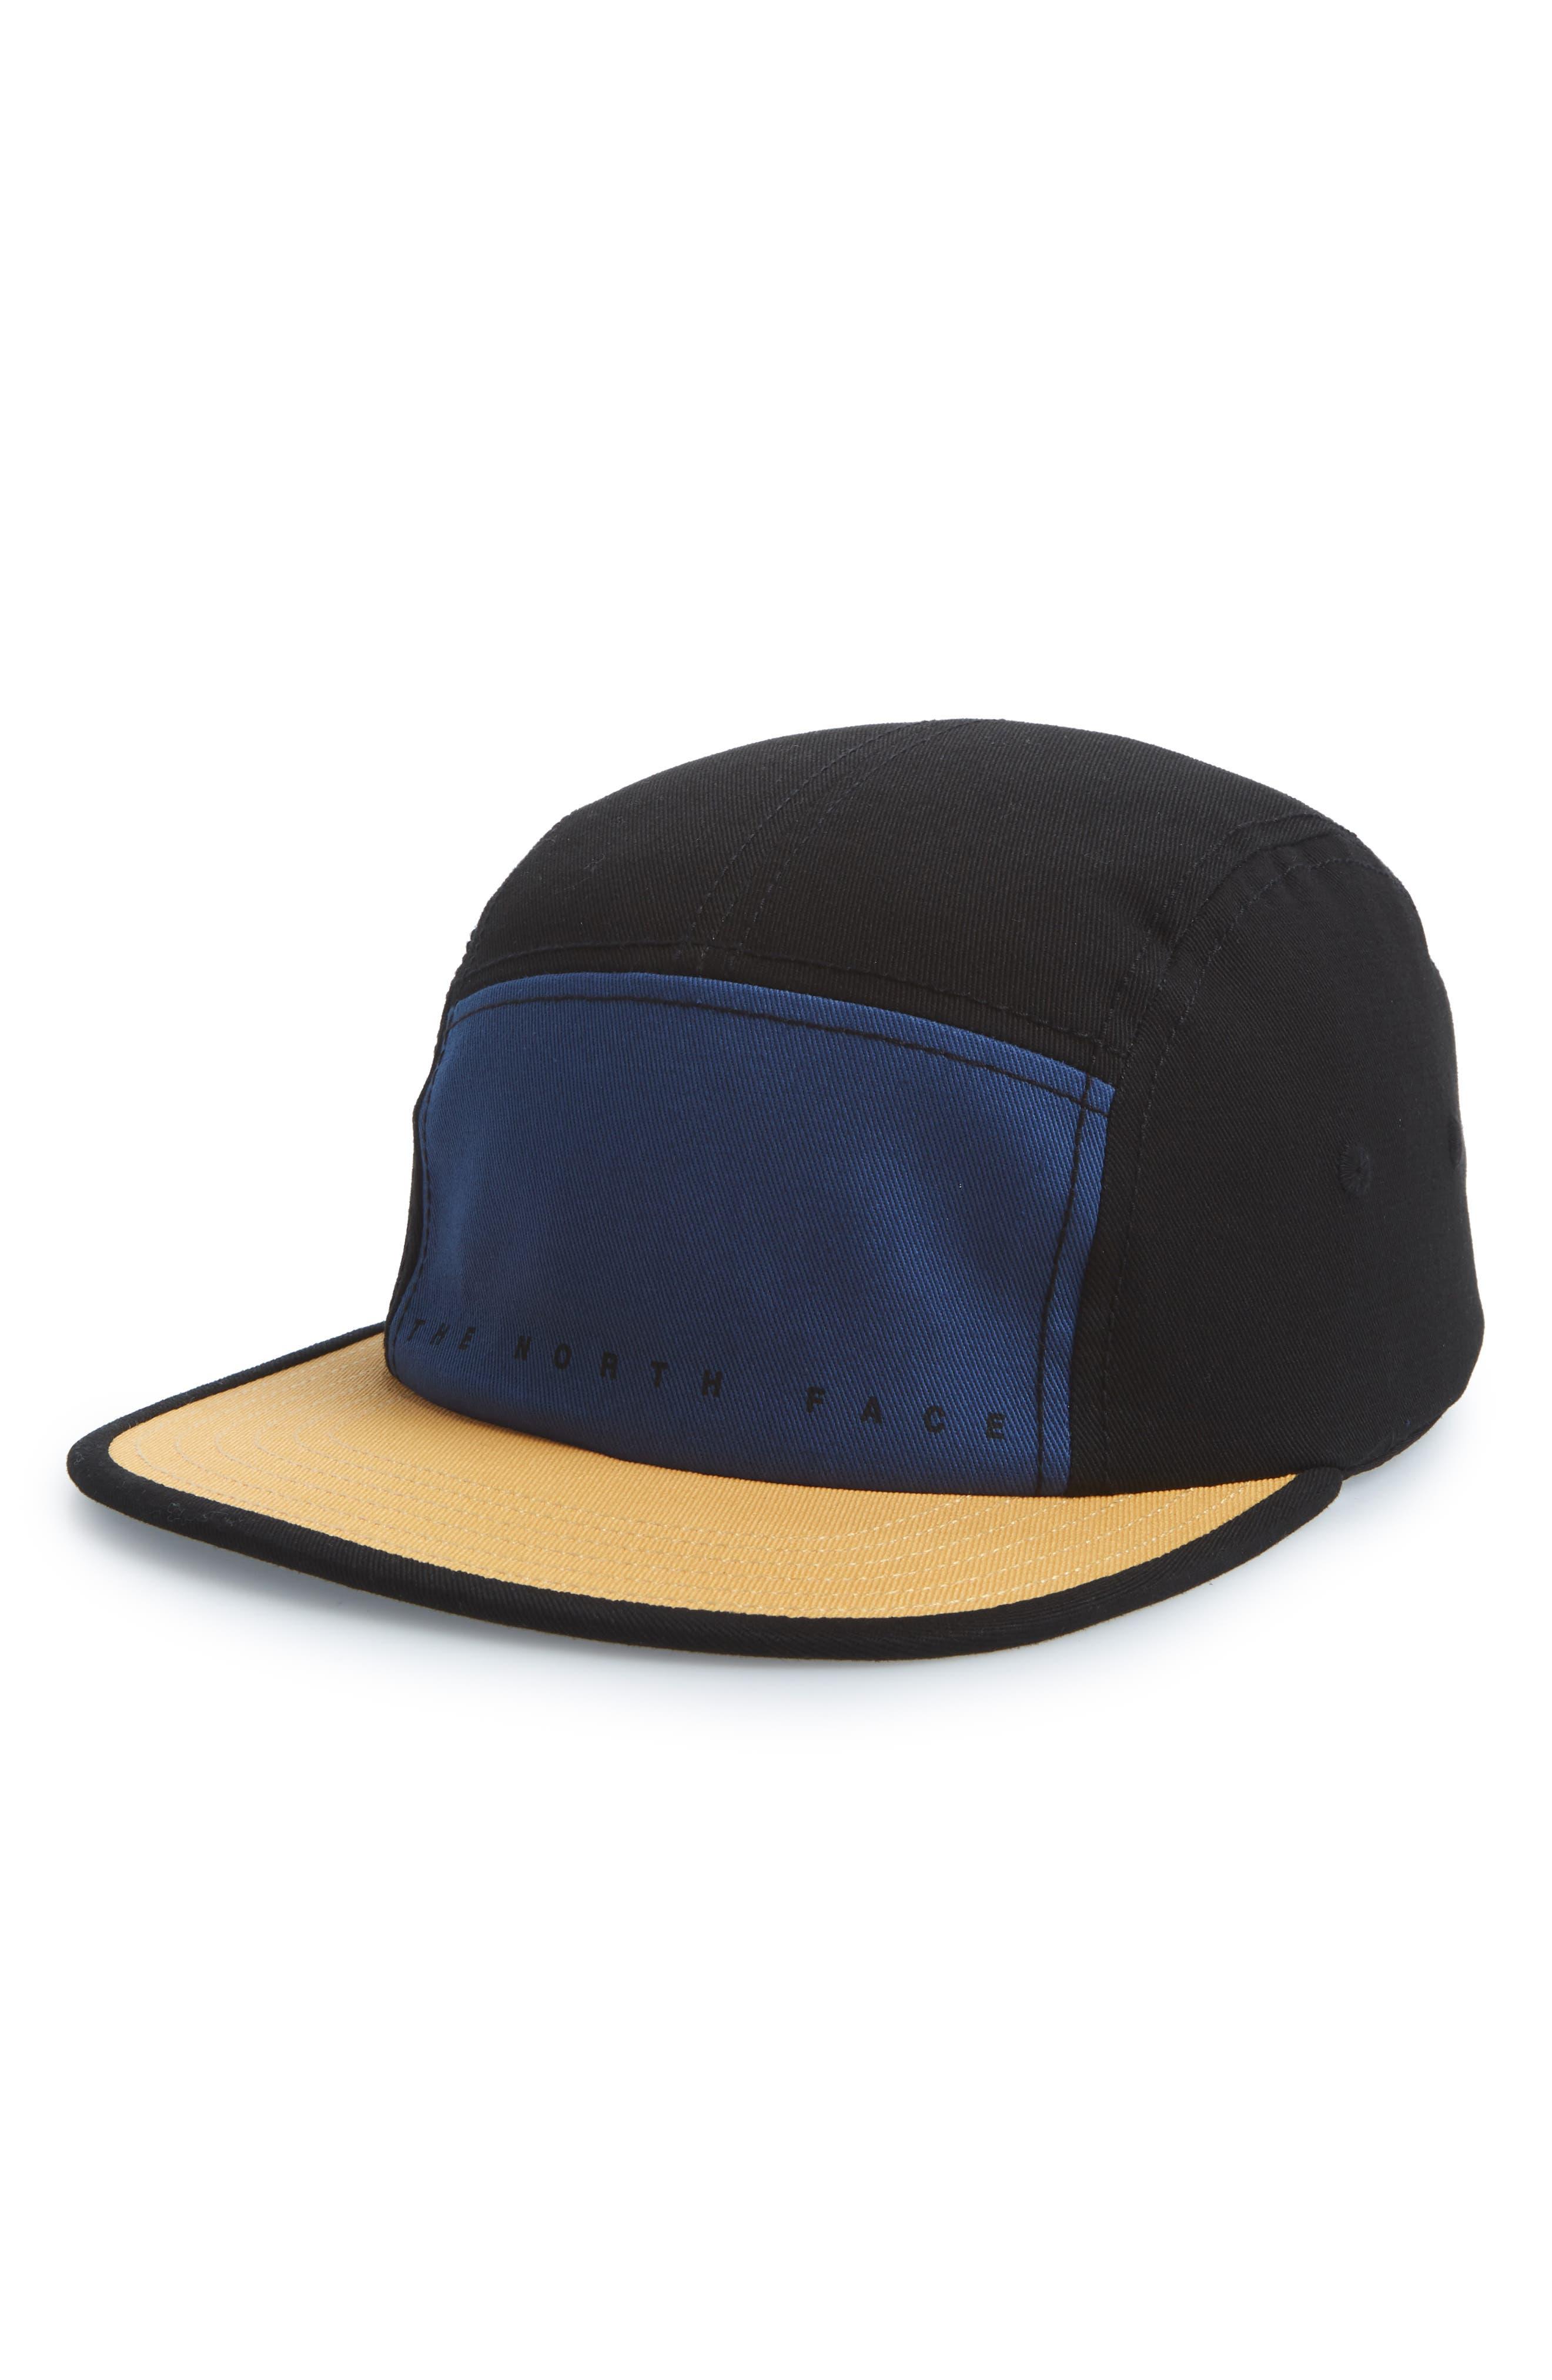 Five-Panel Baseball Cap,                             Main thumbnail 1, color,                             Dish Blue/ Black/ Amber